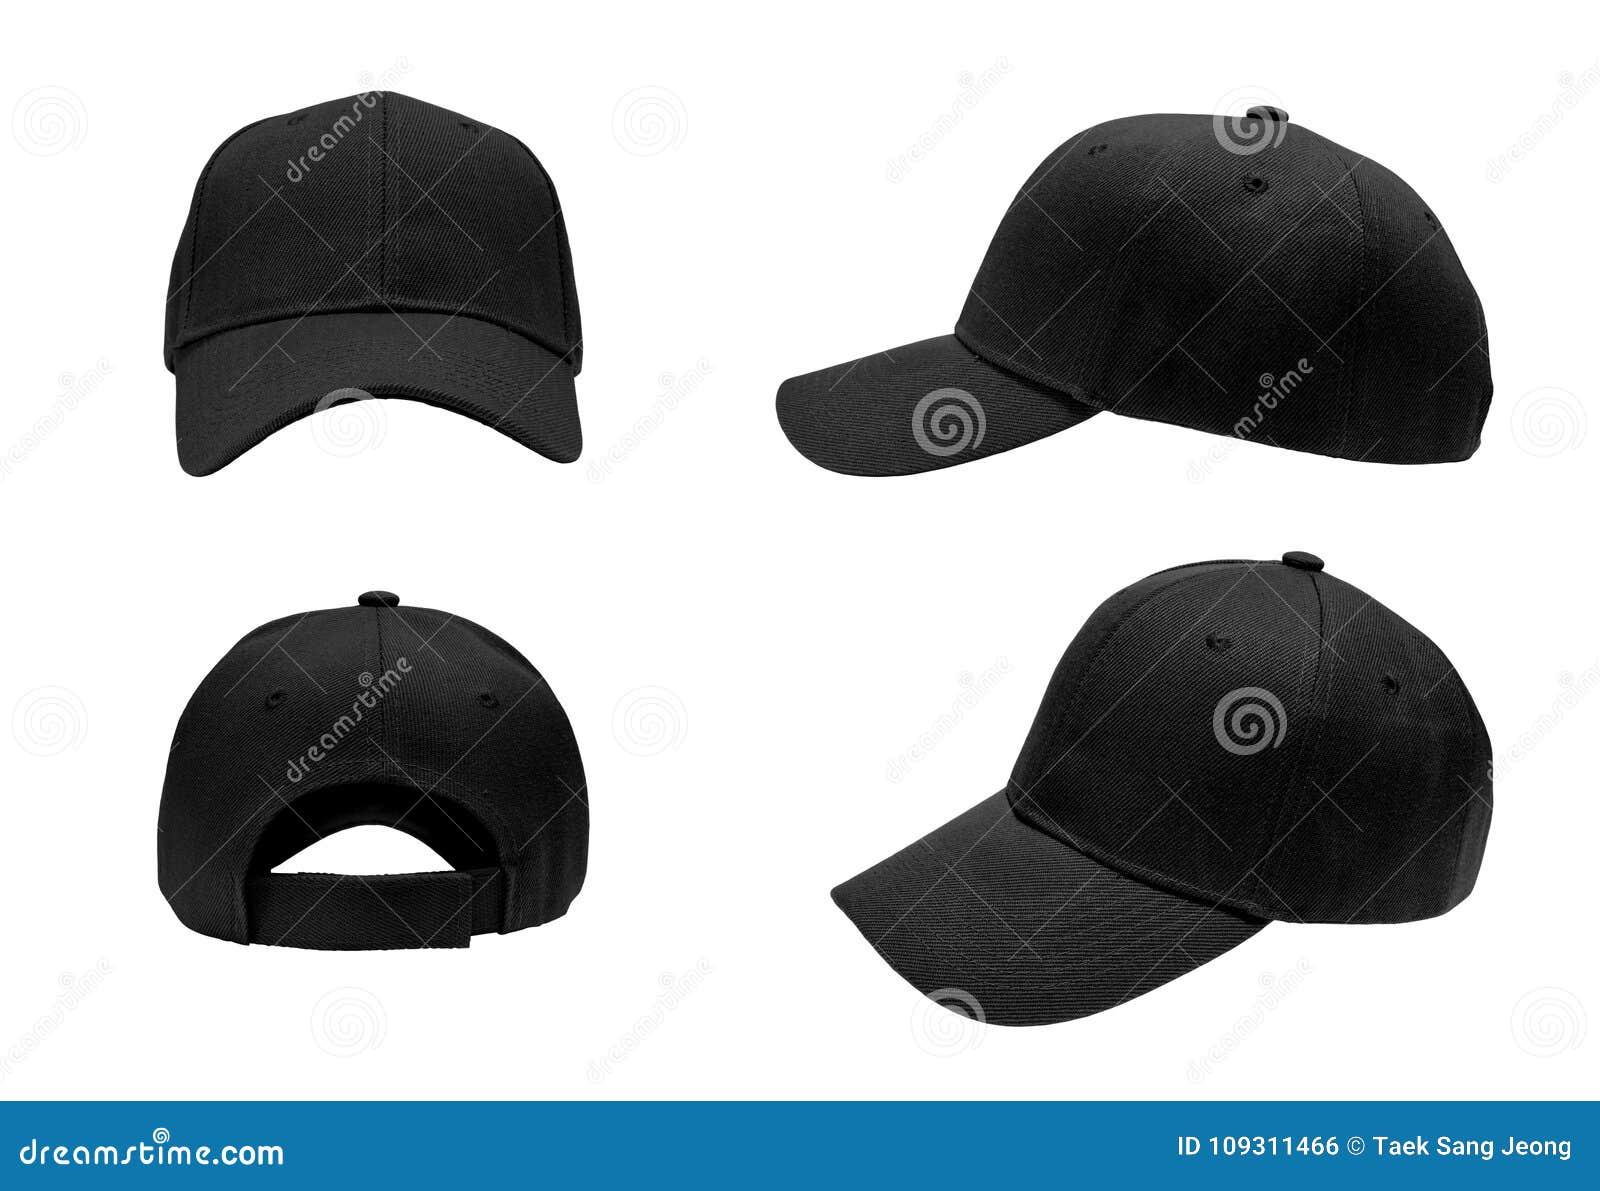 Blank black baseball cap,hat 4 view